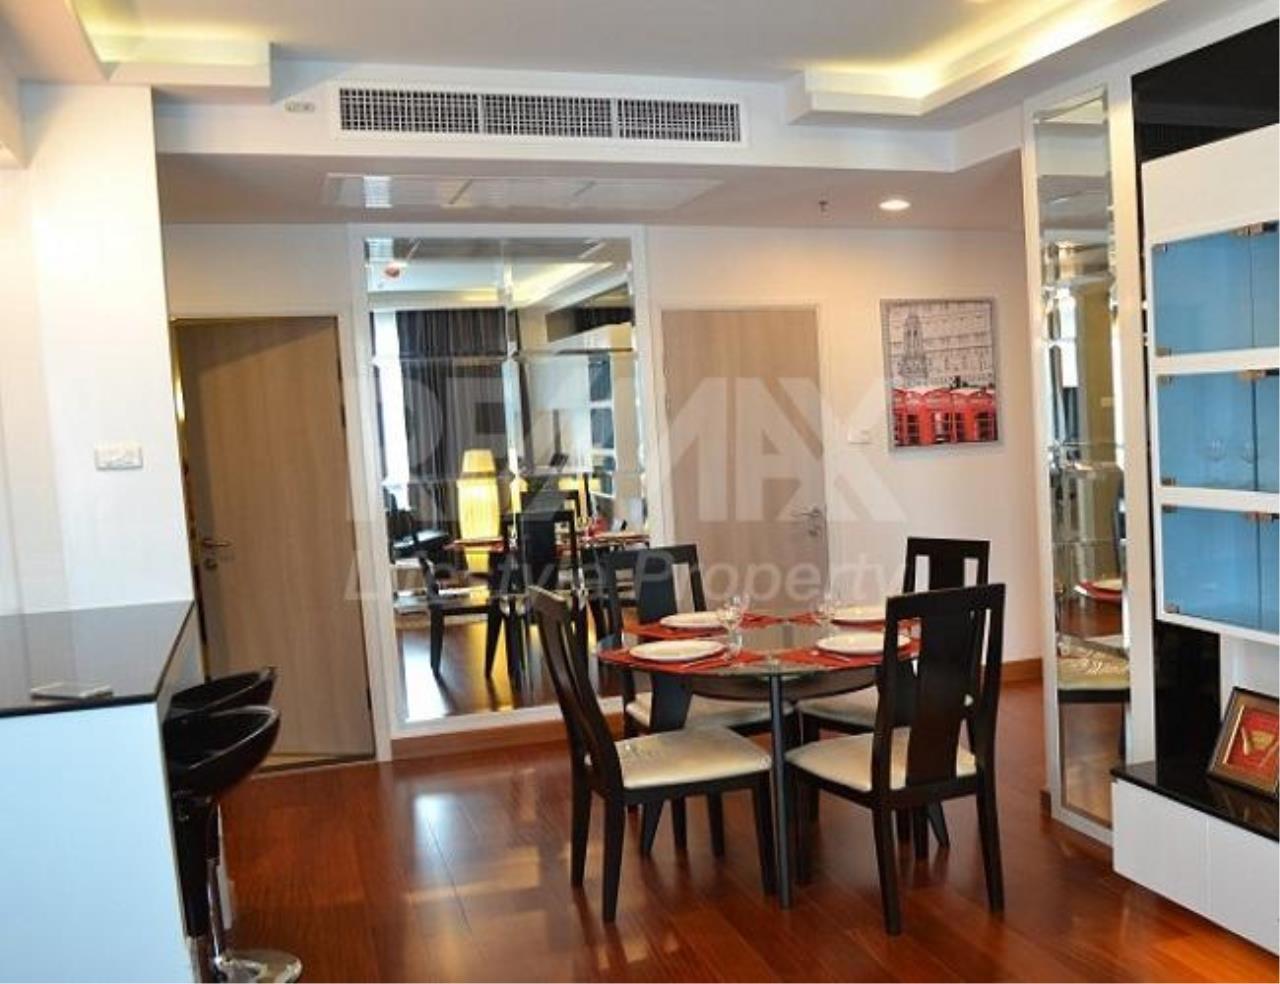 RE/MAX LifeStyle Property Agency's Supalai Lite Sathorn - Charoenrat 2